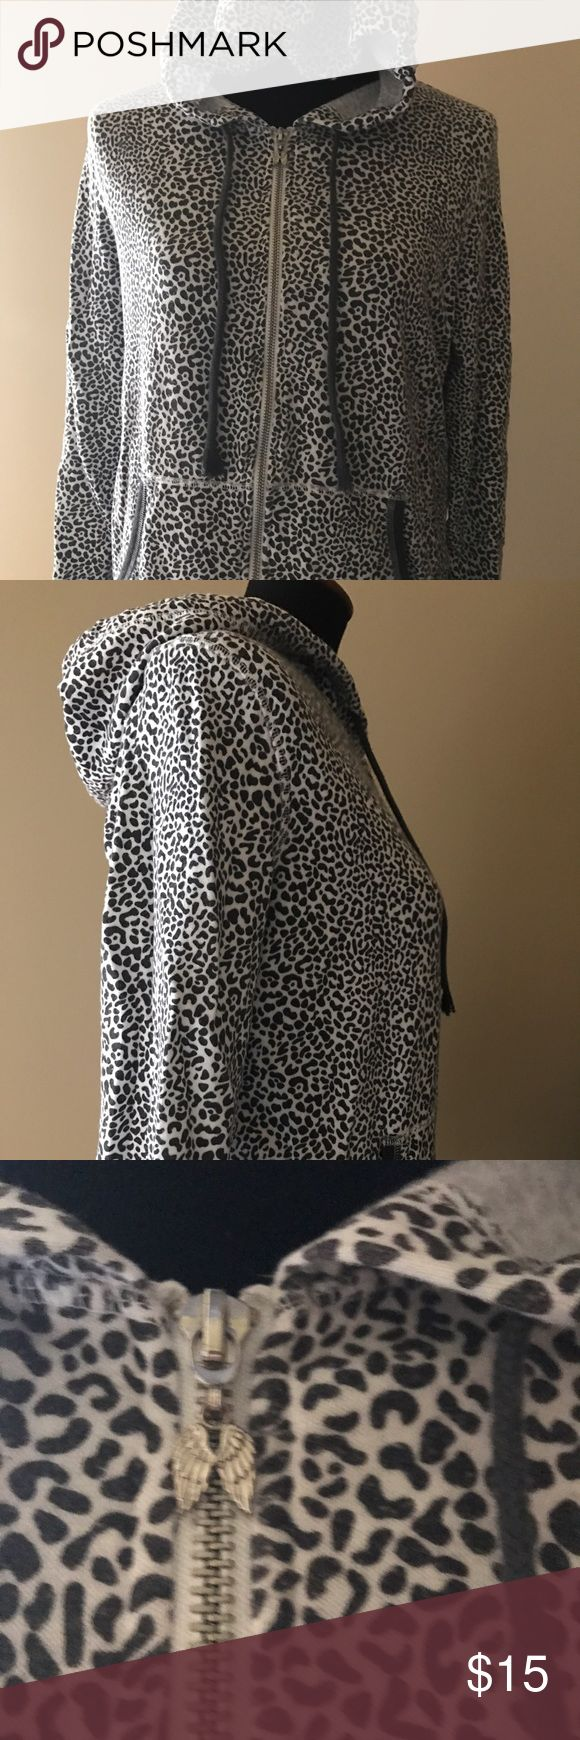 Victoria's Secret zip-up hoodie Cute! Gently used. Fun animal print pattern. Victoria's Secret Jackets & Coats